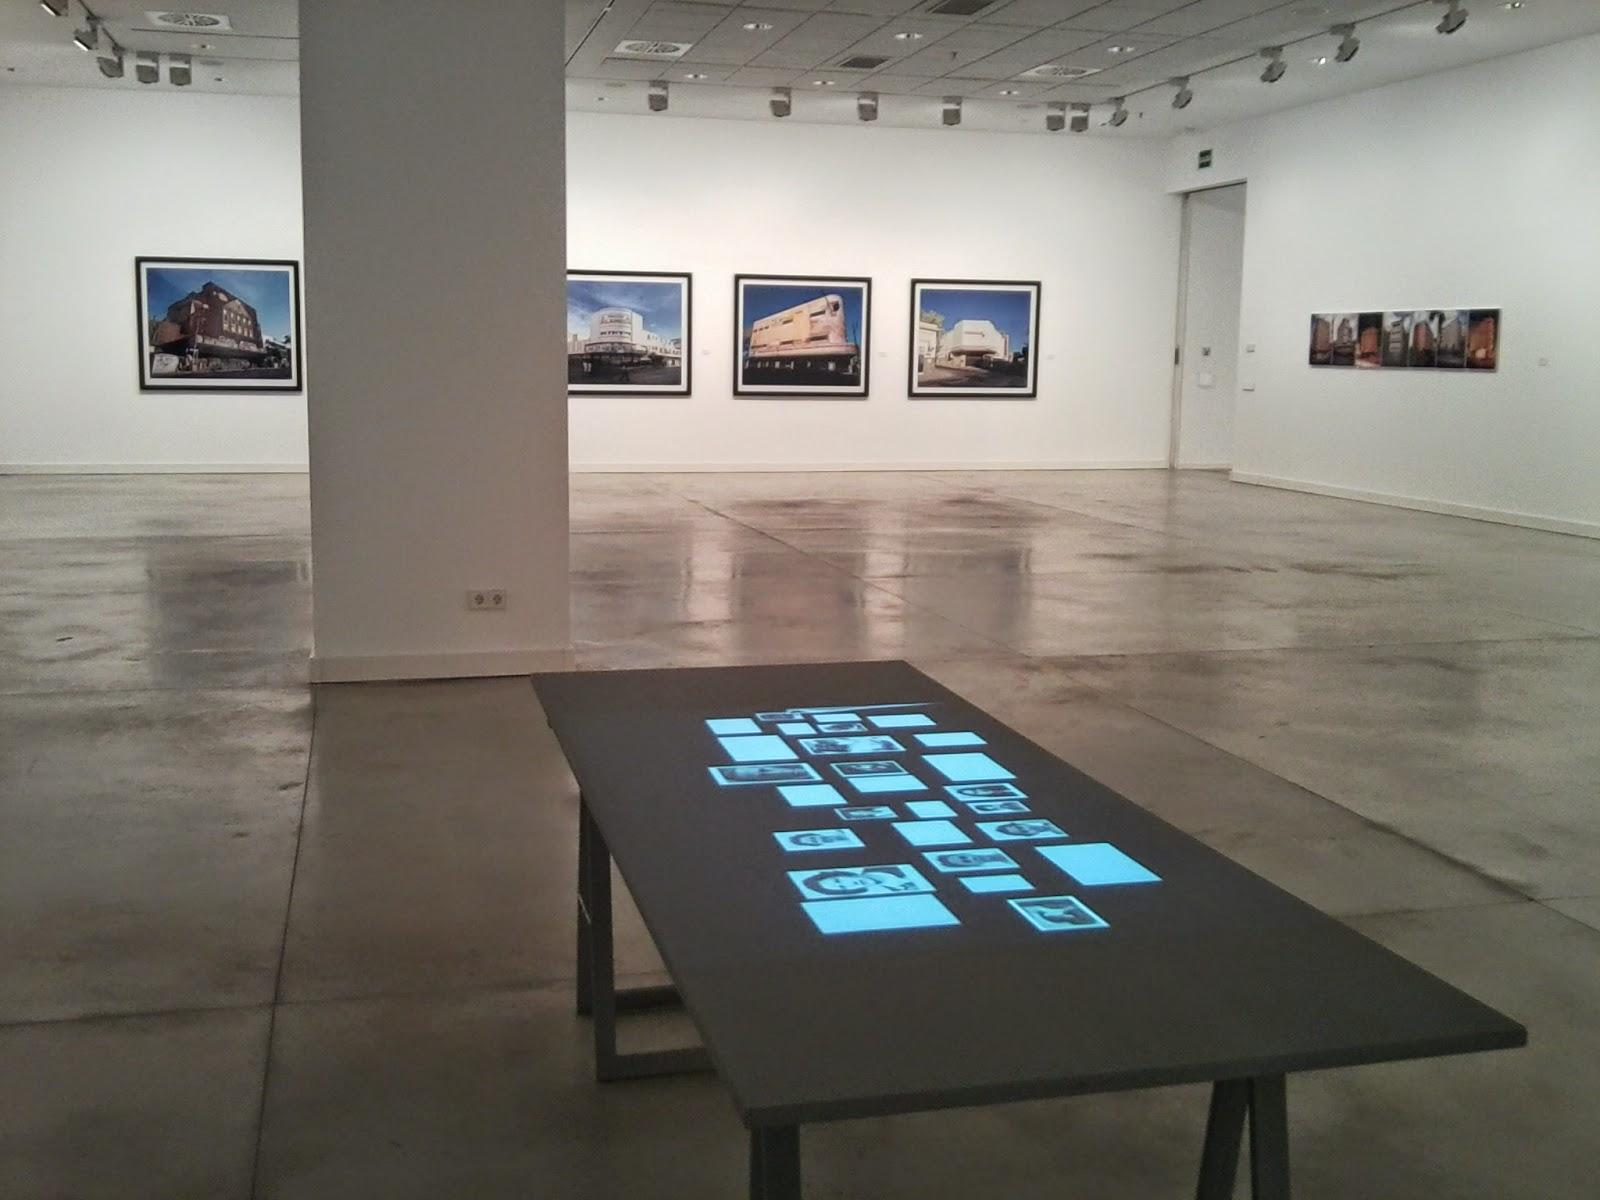 Blog de Arte, Voa-Gallery, Fundación ARCO, Colección, fotografía, Centro de Arte Alcobendas, Exposición temporal, Variation, Instalación, Oscar Muñoz, Video Art,